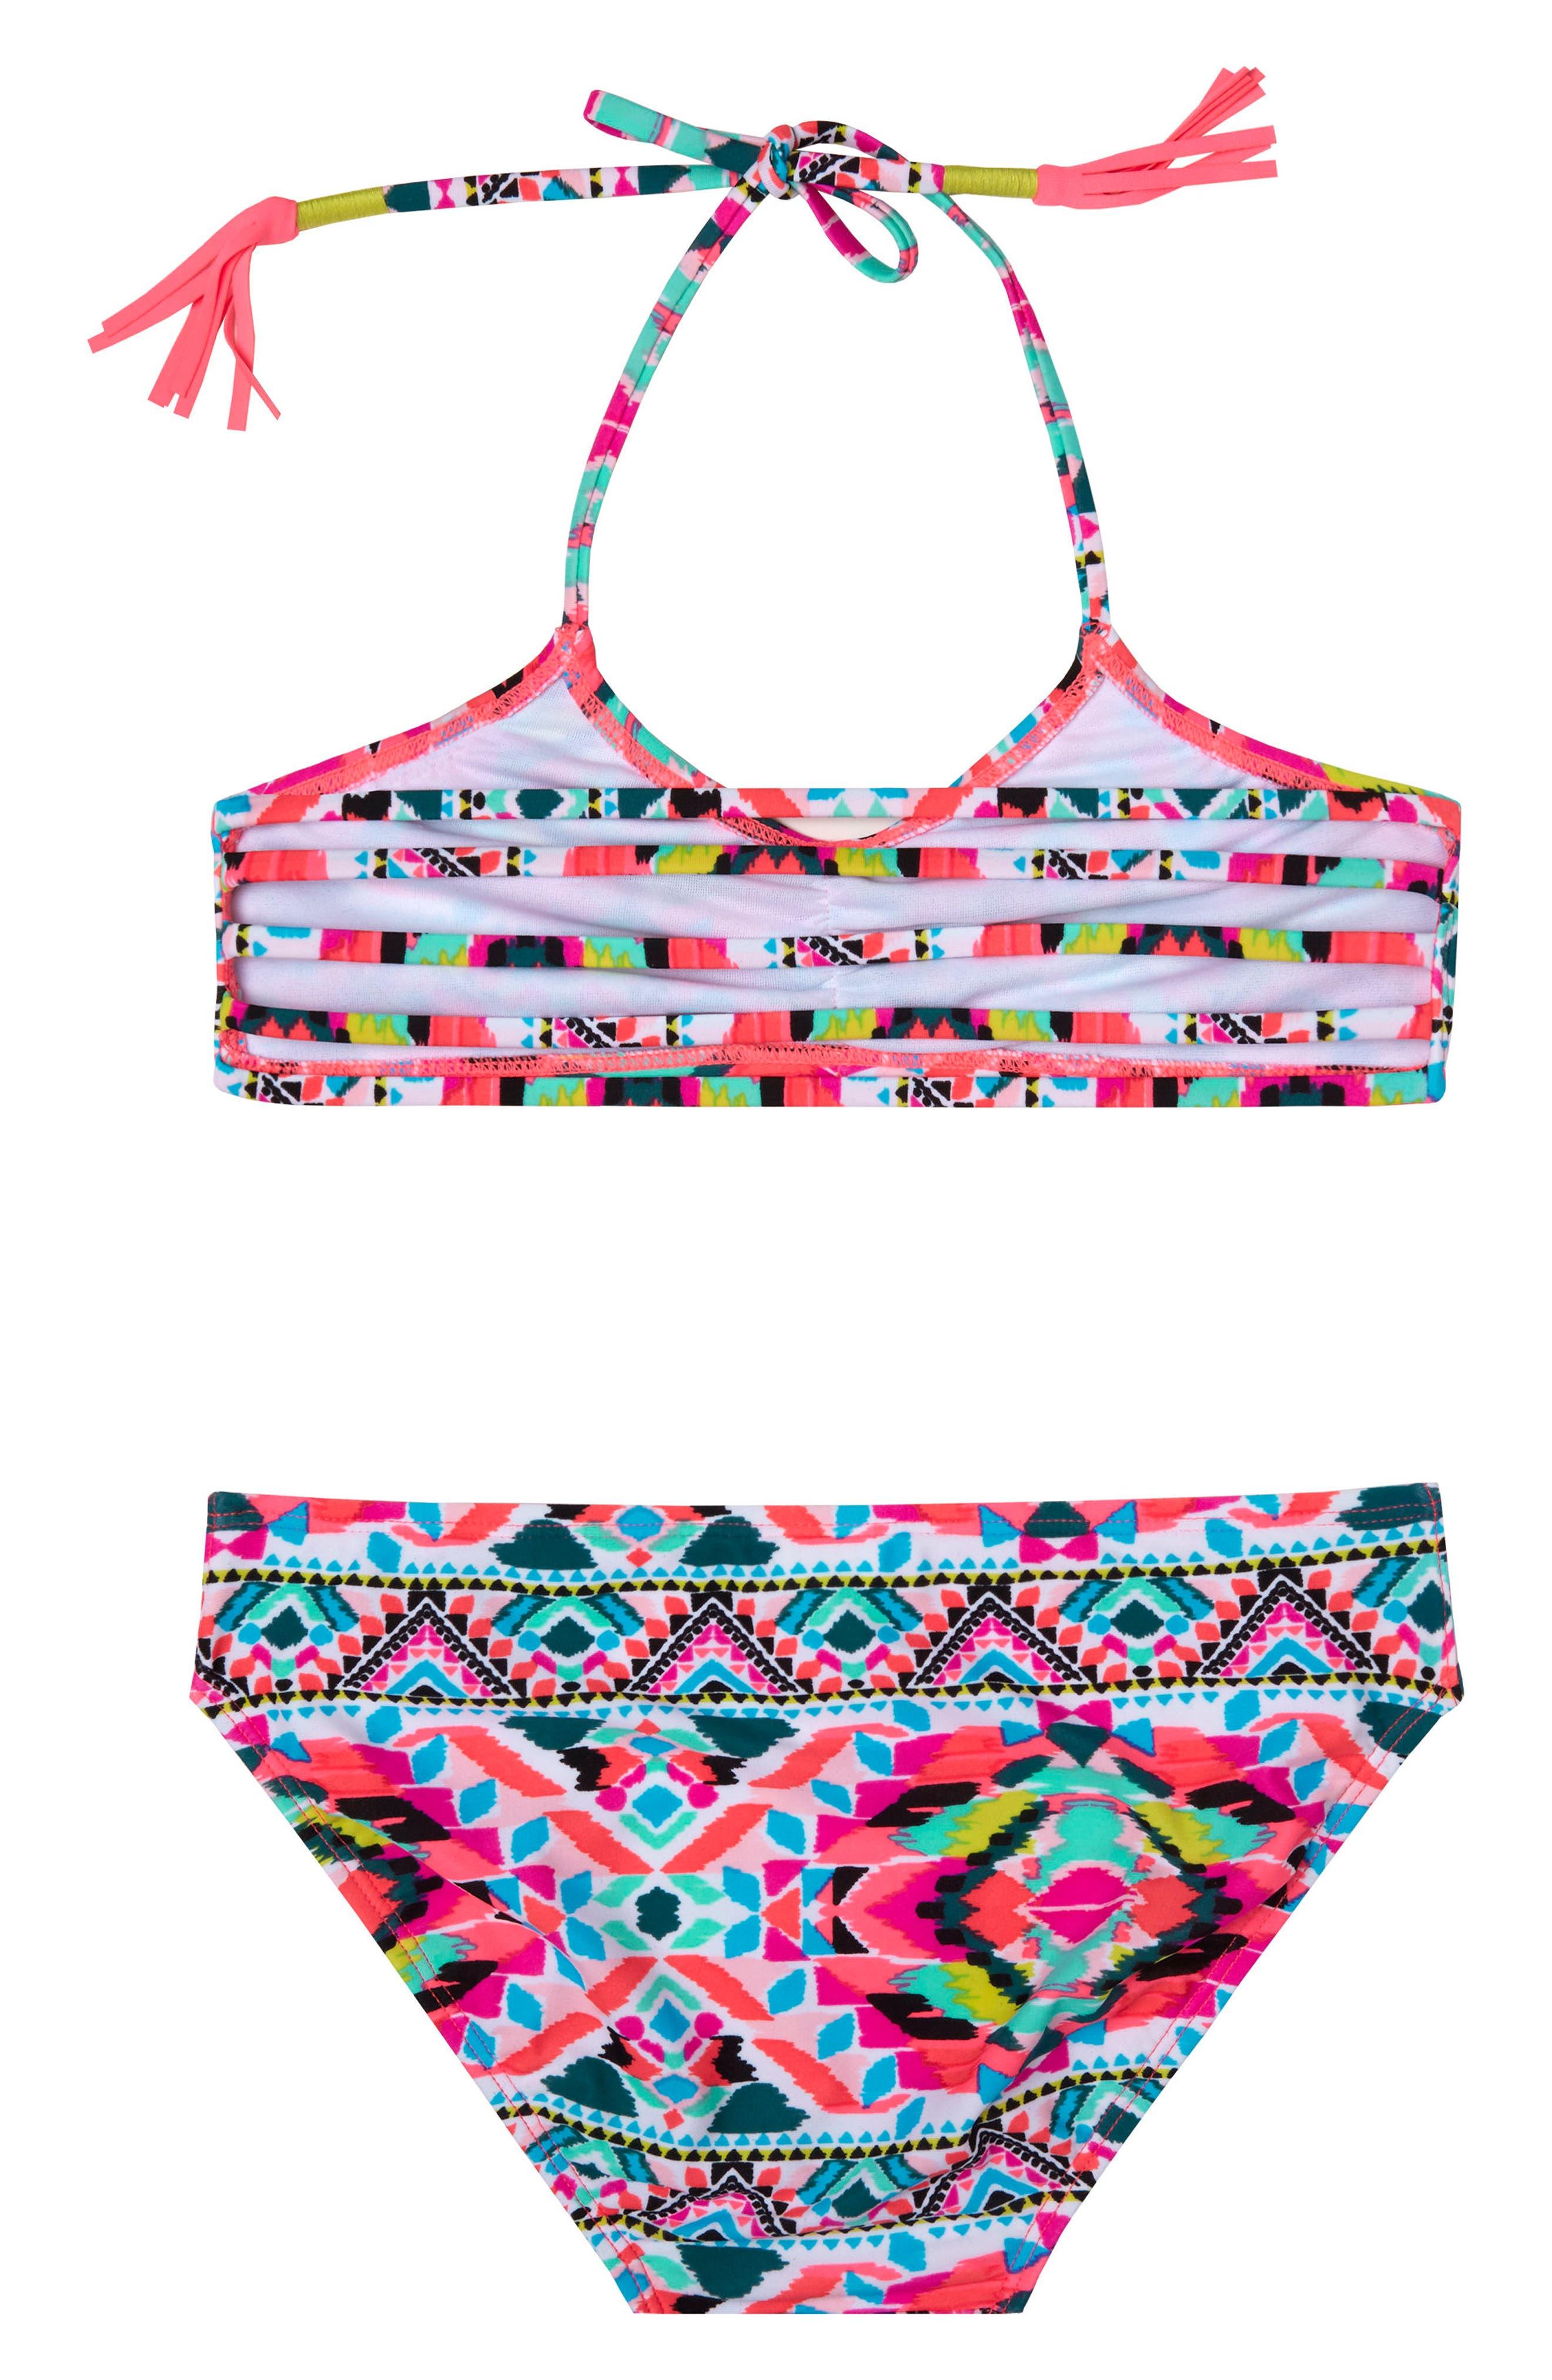 Surfside Solstice Two-Piece Swimsuit,                             Alternate thumbnail 2, color,                             Pink